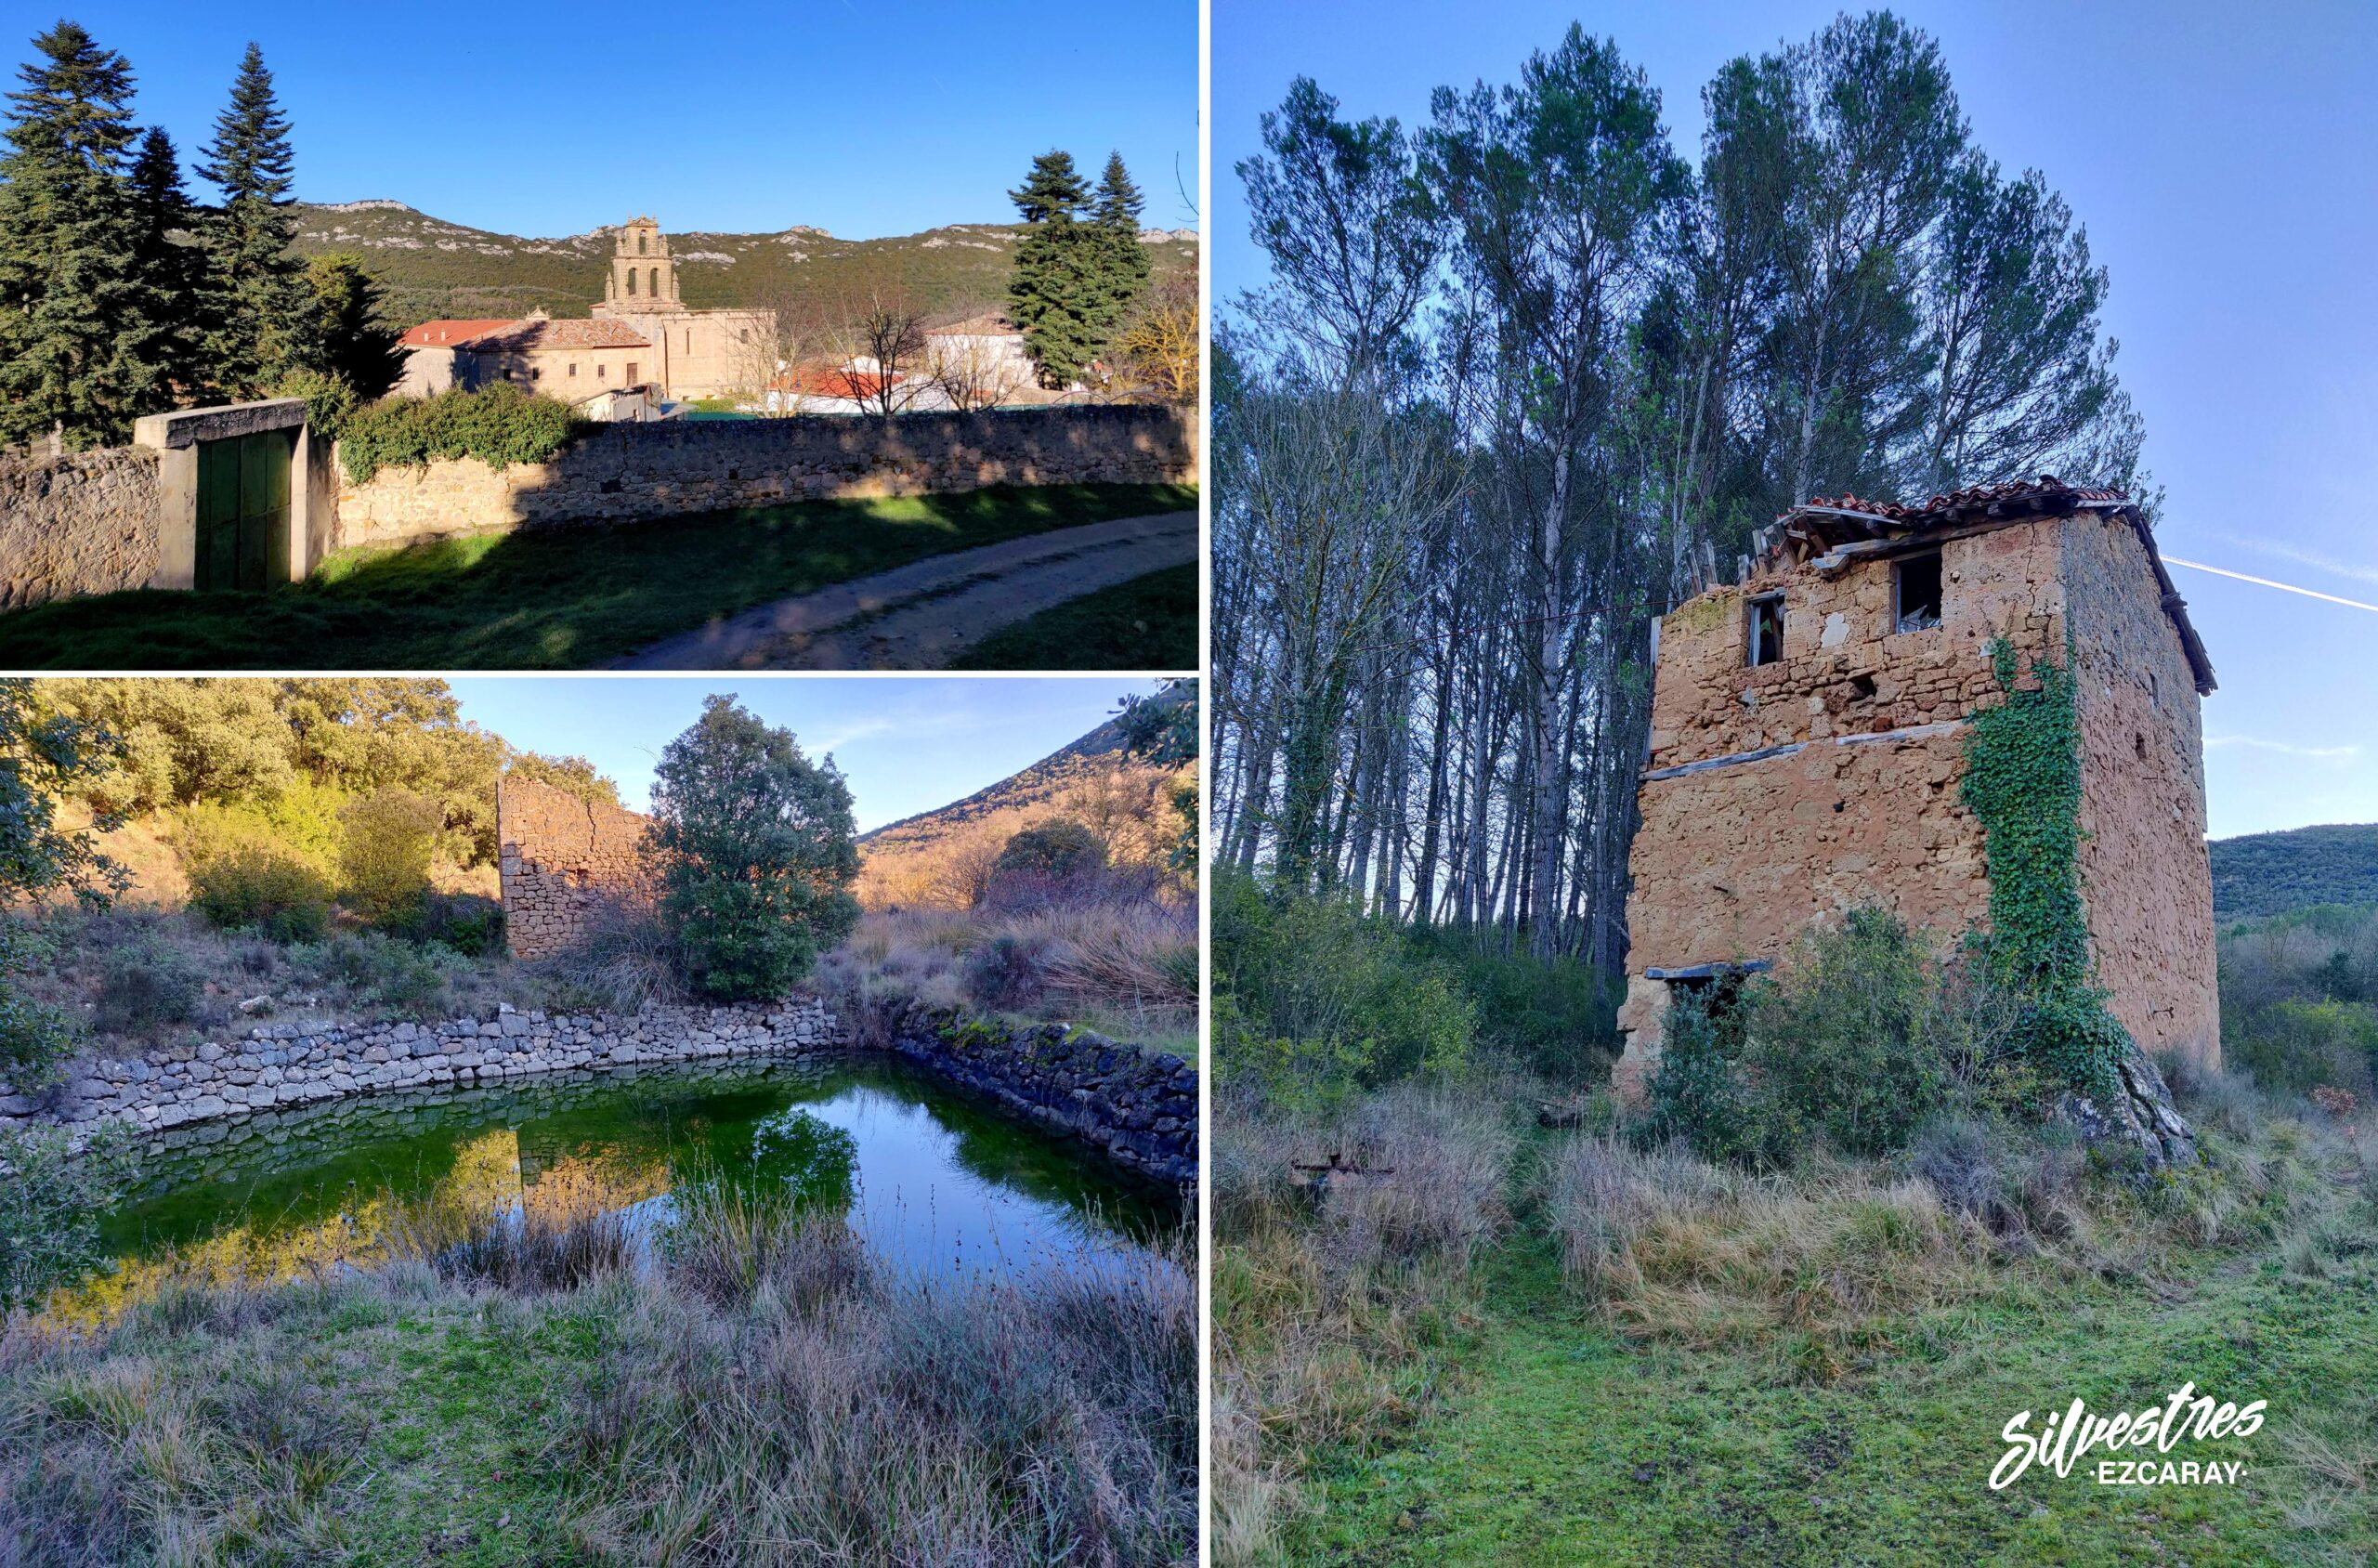 monasterio_herrera_salinas_montes_obarenes_la_rioja_guia_senderimo_rutas